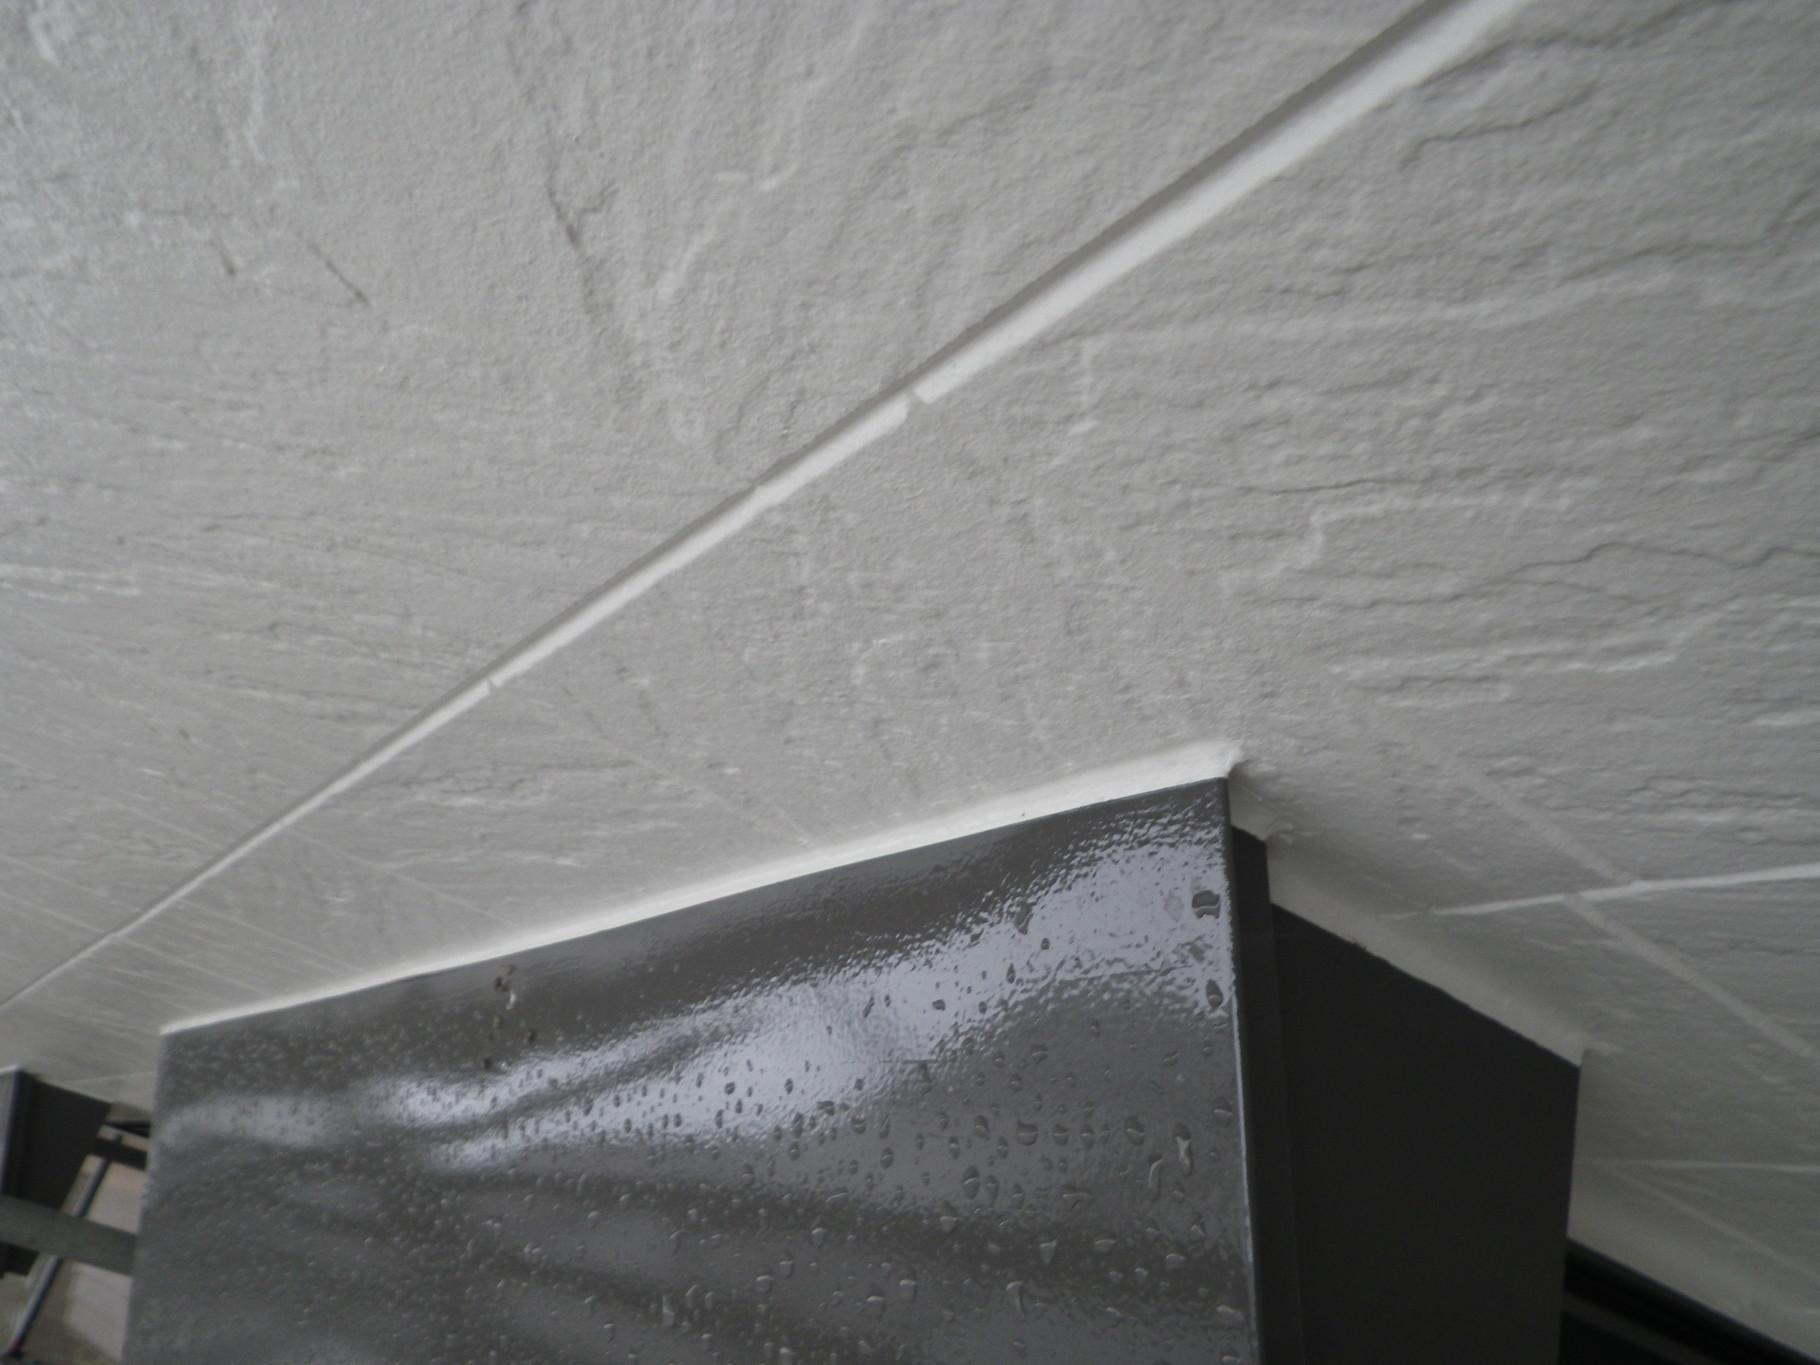 熊本市N様家の外壁塗装及び屋根塗装時。外壁と鉄板庇屋根の塗り替え完成。